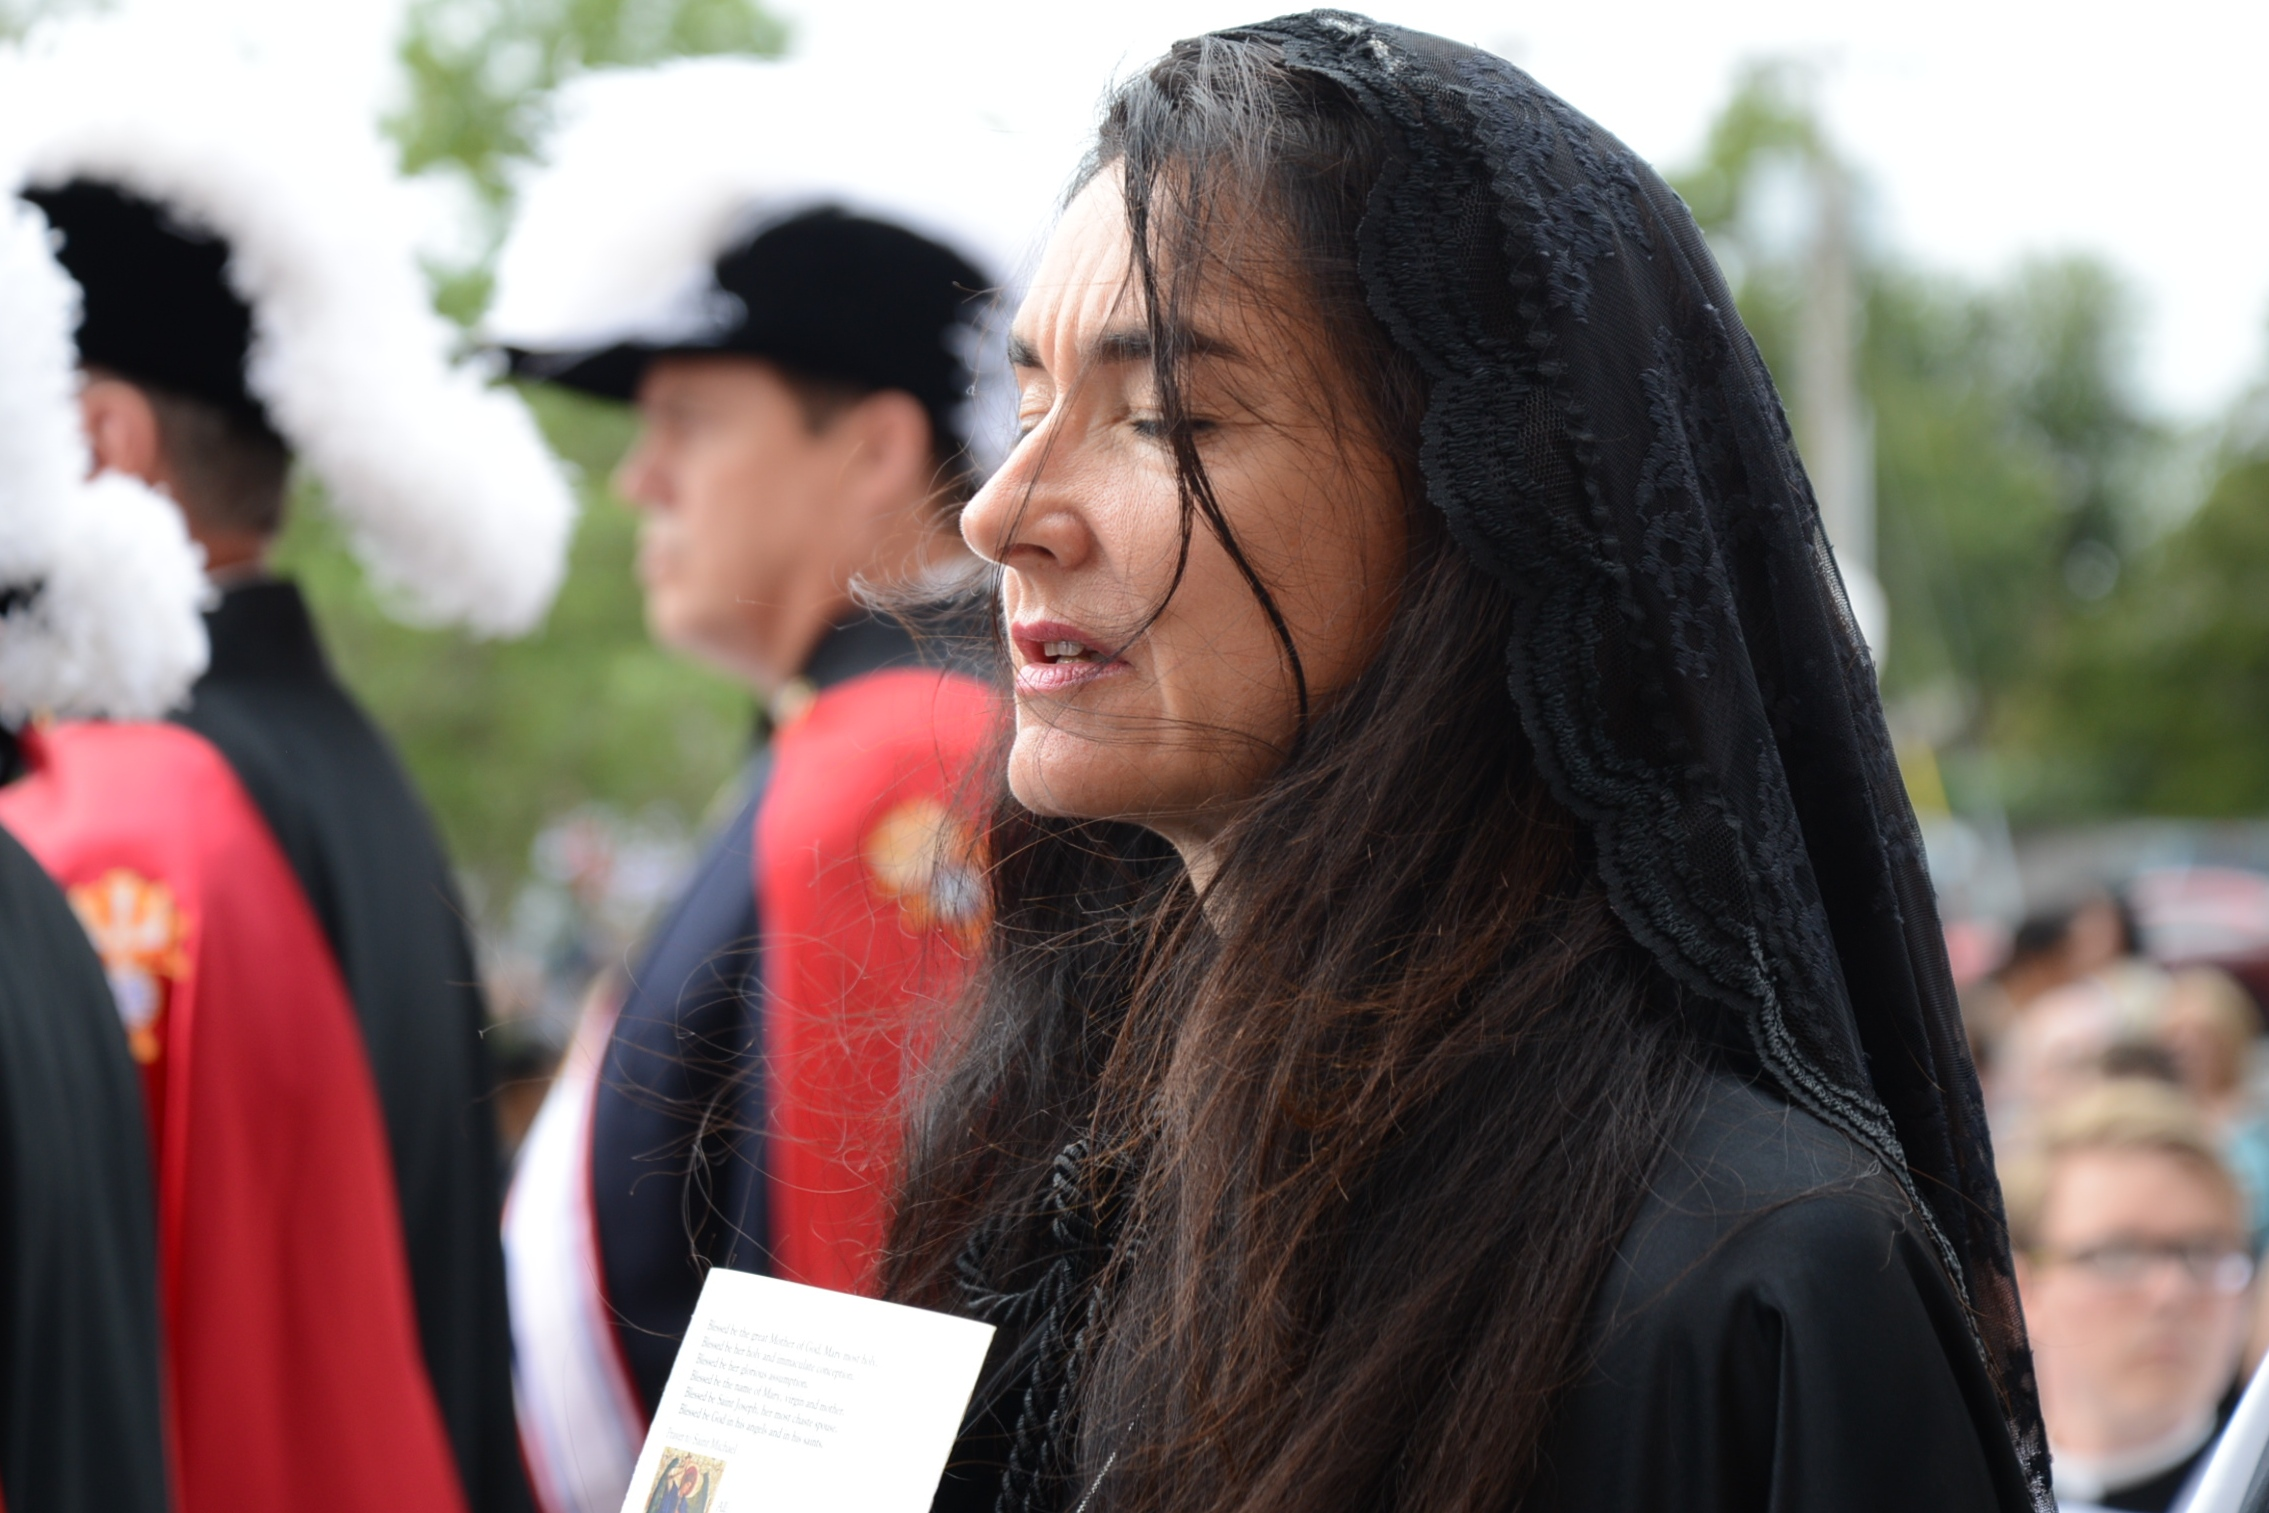 Woman in black prayer veil